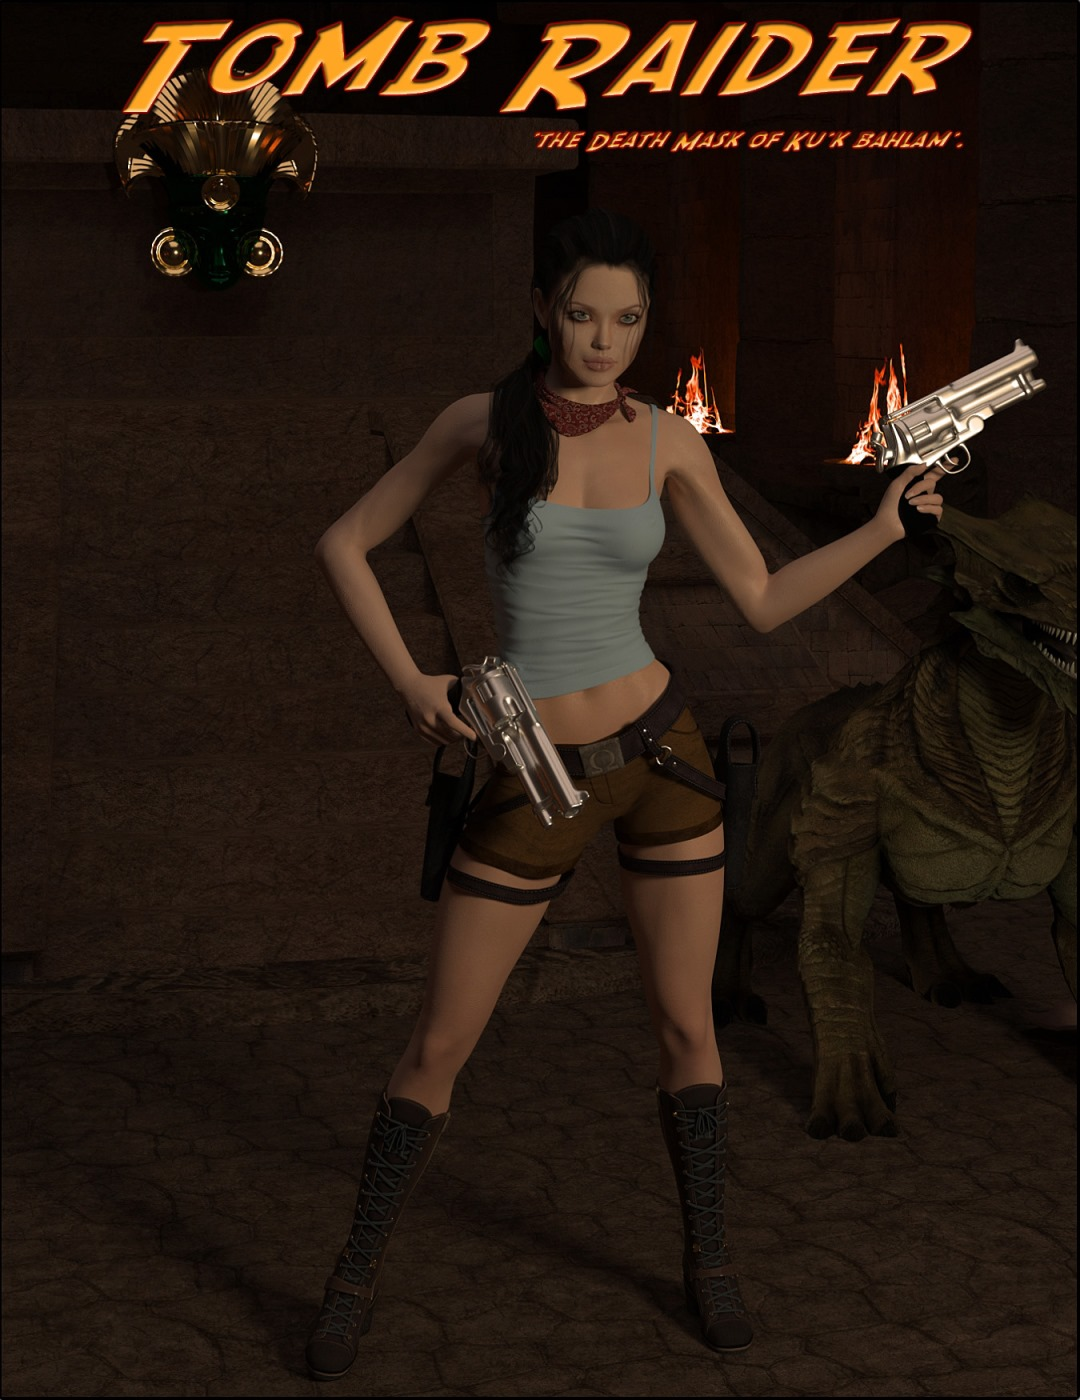 Tomb Raider – Death Mask of 'Ku'k Bahlam' porn comics 8 muses